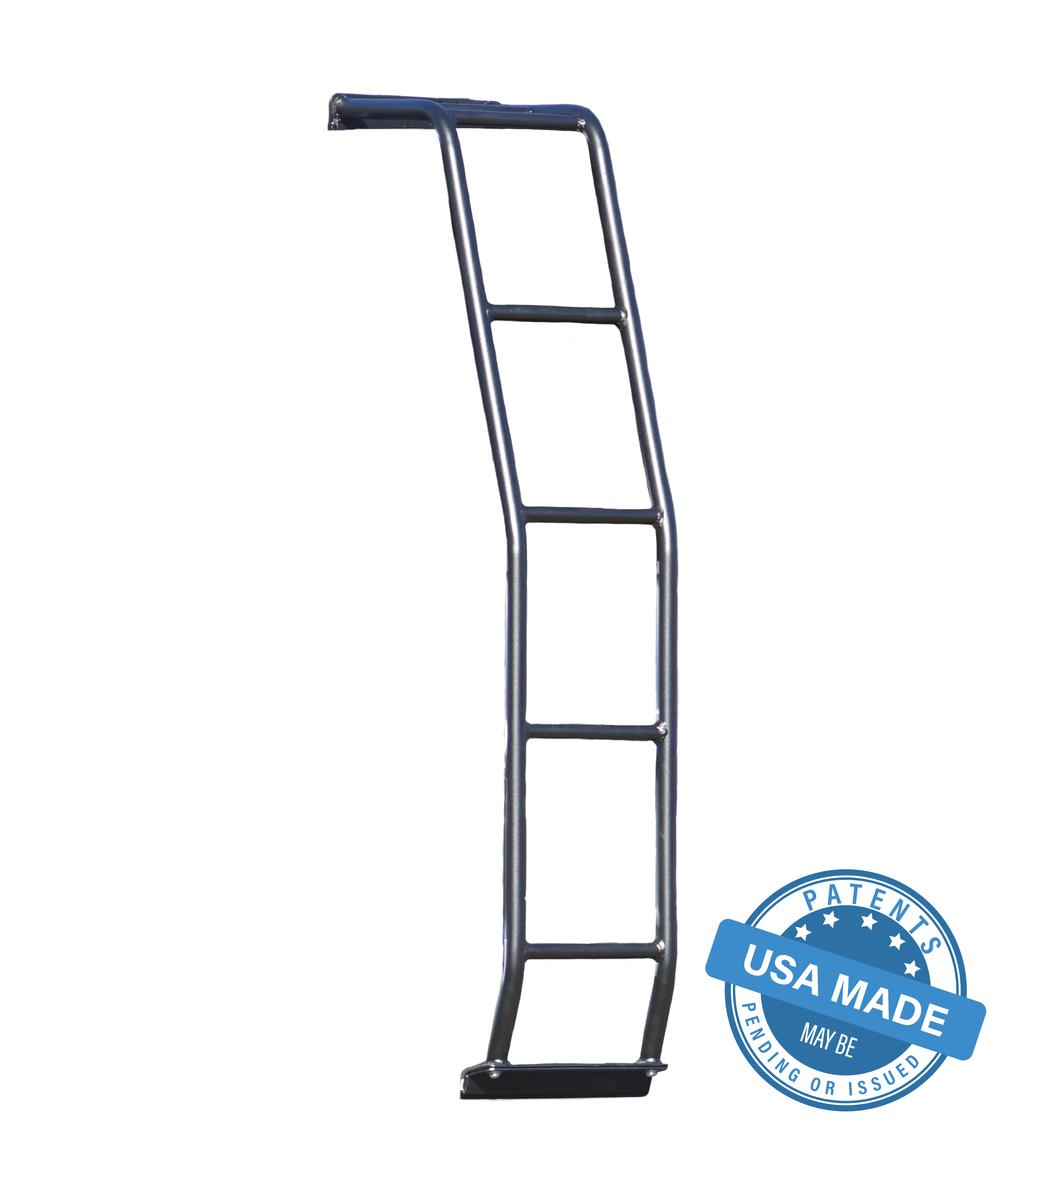 GOBI Lexus GX470 Rear Ladder Stealth/Ranger*